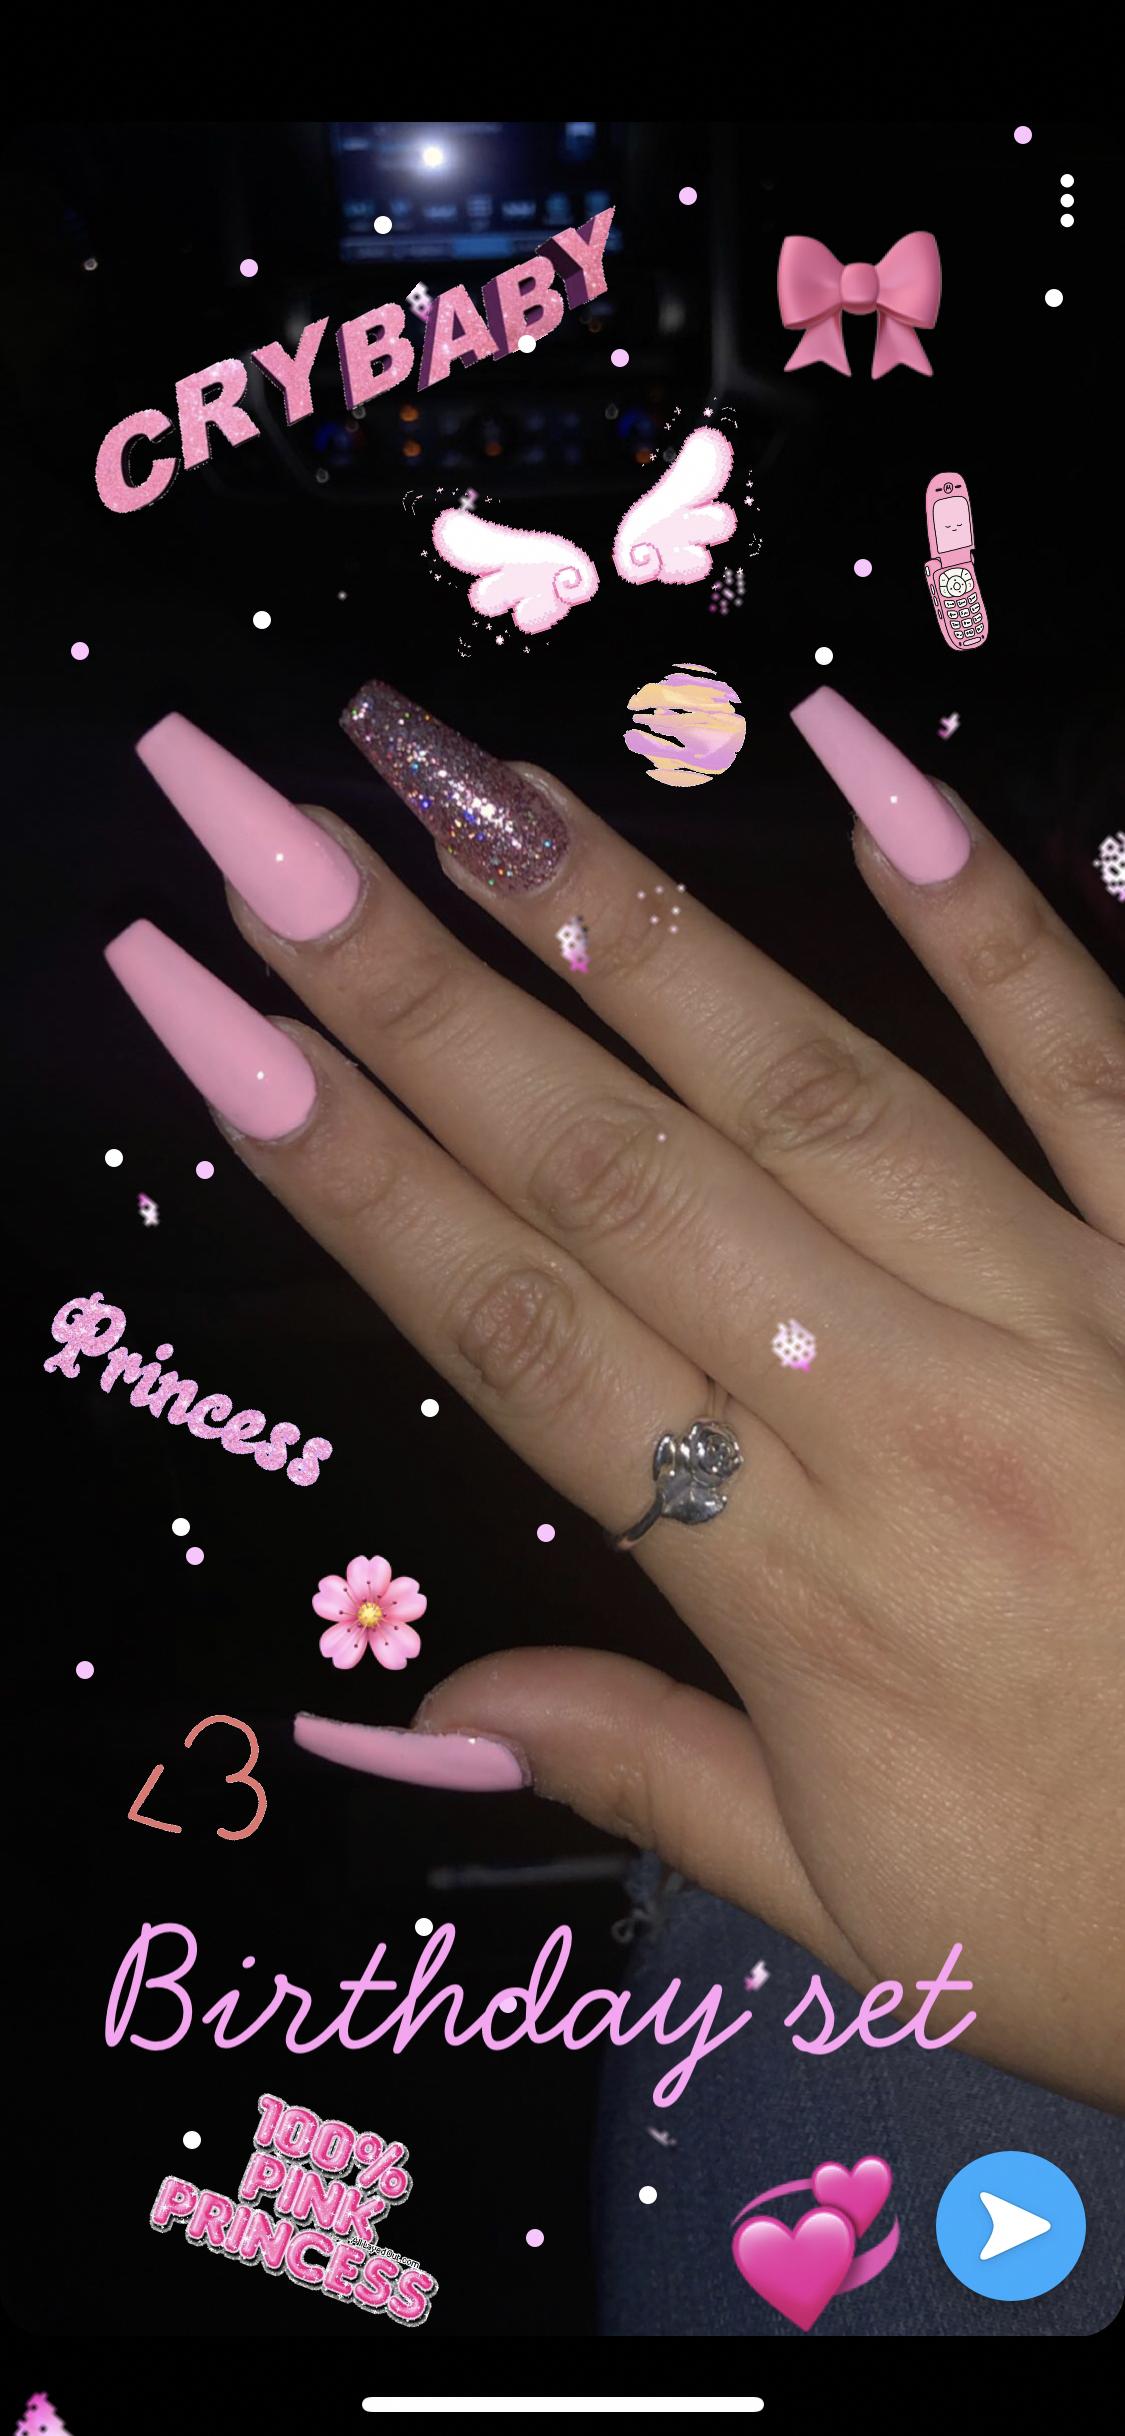 My 18th Birthday Set Pink Acrylic Nails Glitter Coffin Baddie Nailart Nailinspiratio Acrylic Nails Coffin Pink Best Acrylic Nails Long Acrylic Nails